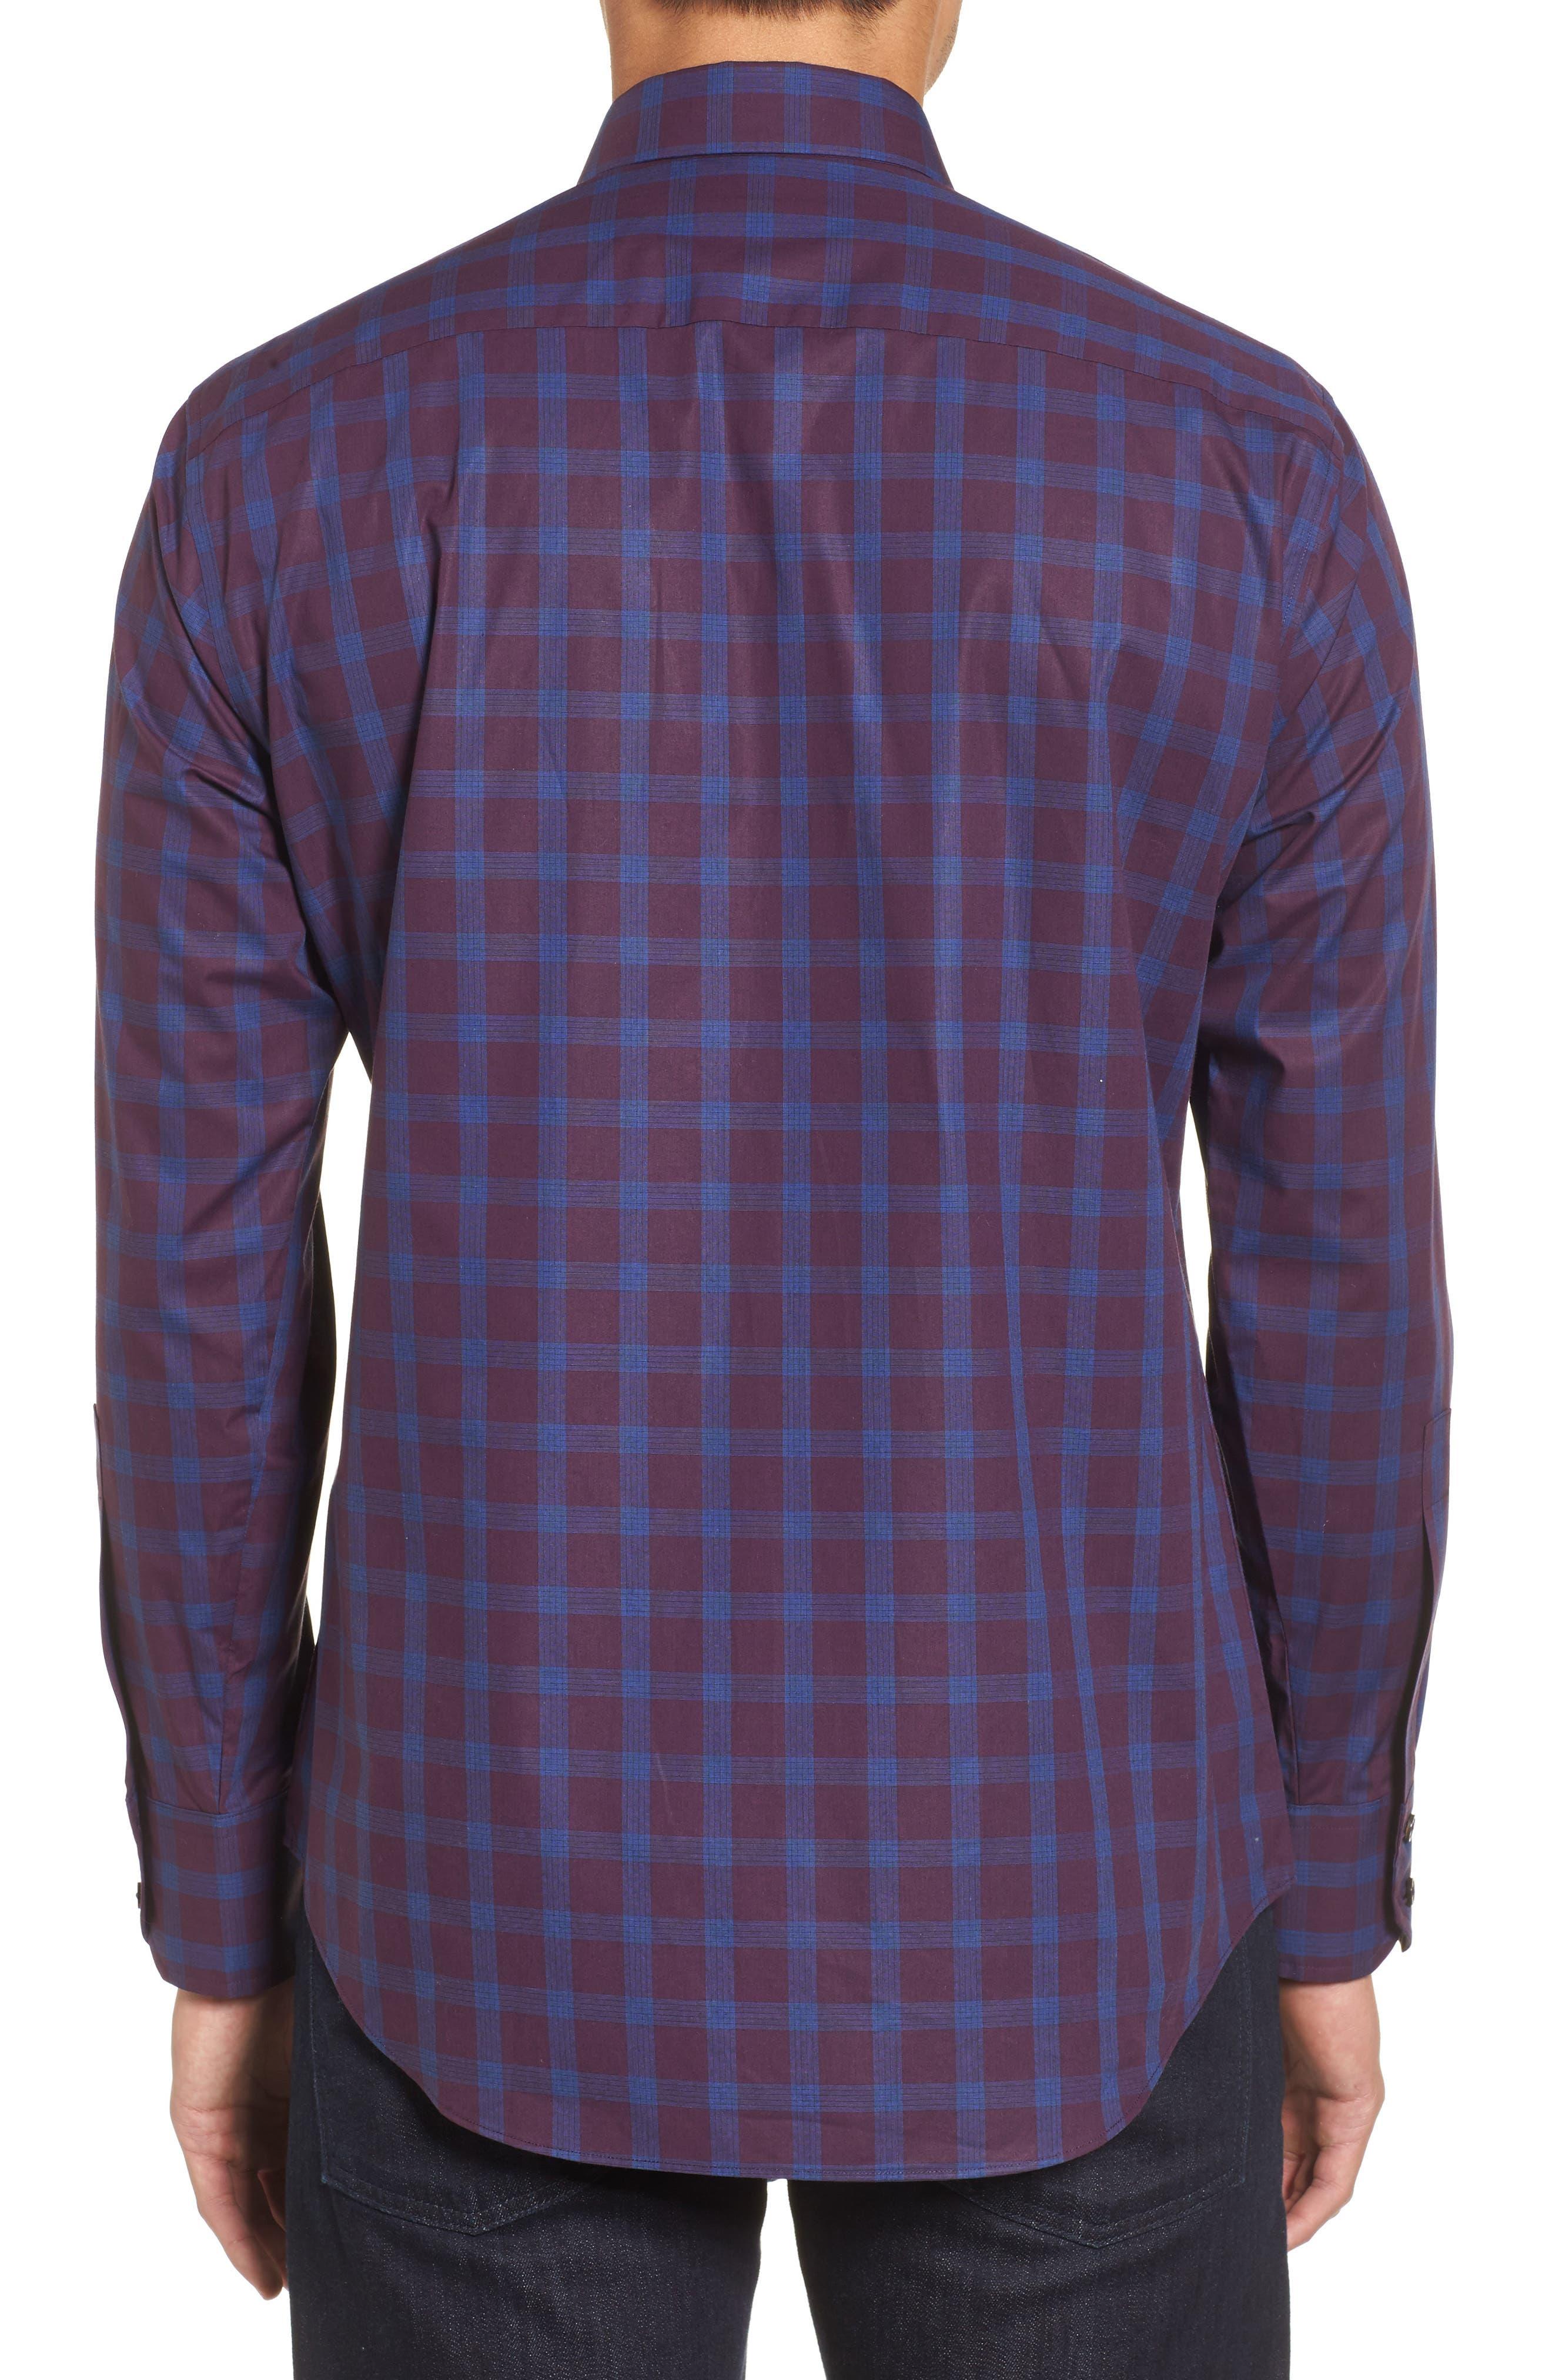 Raymond Check Sport Shirt,                             Alternate thumbnail 2, color,                             930